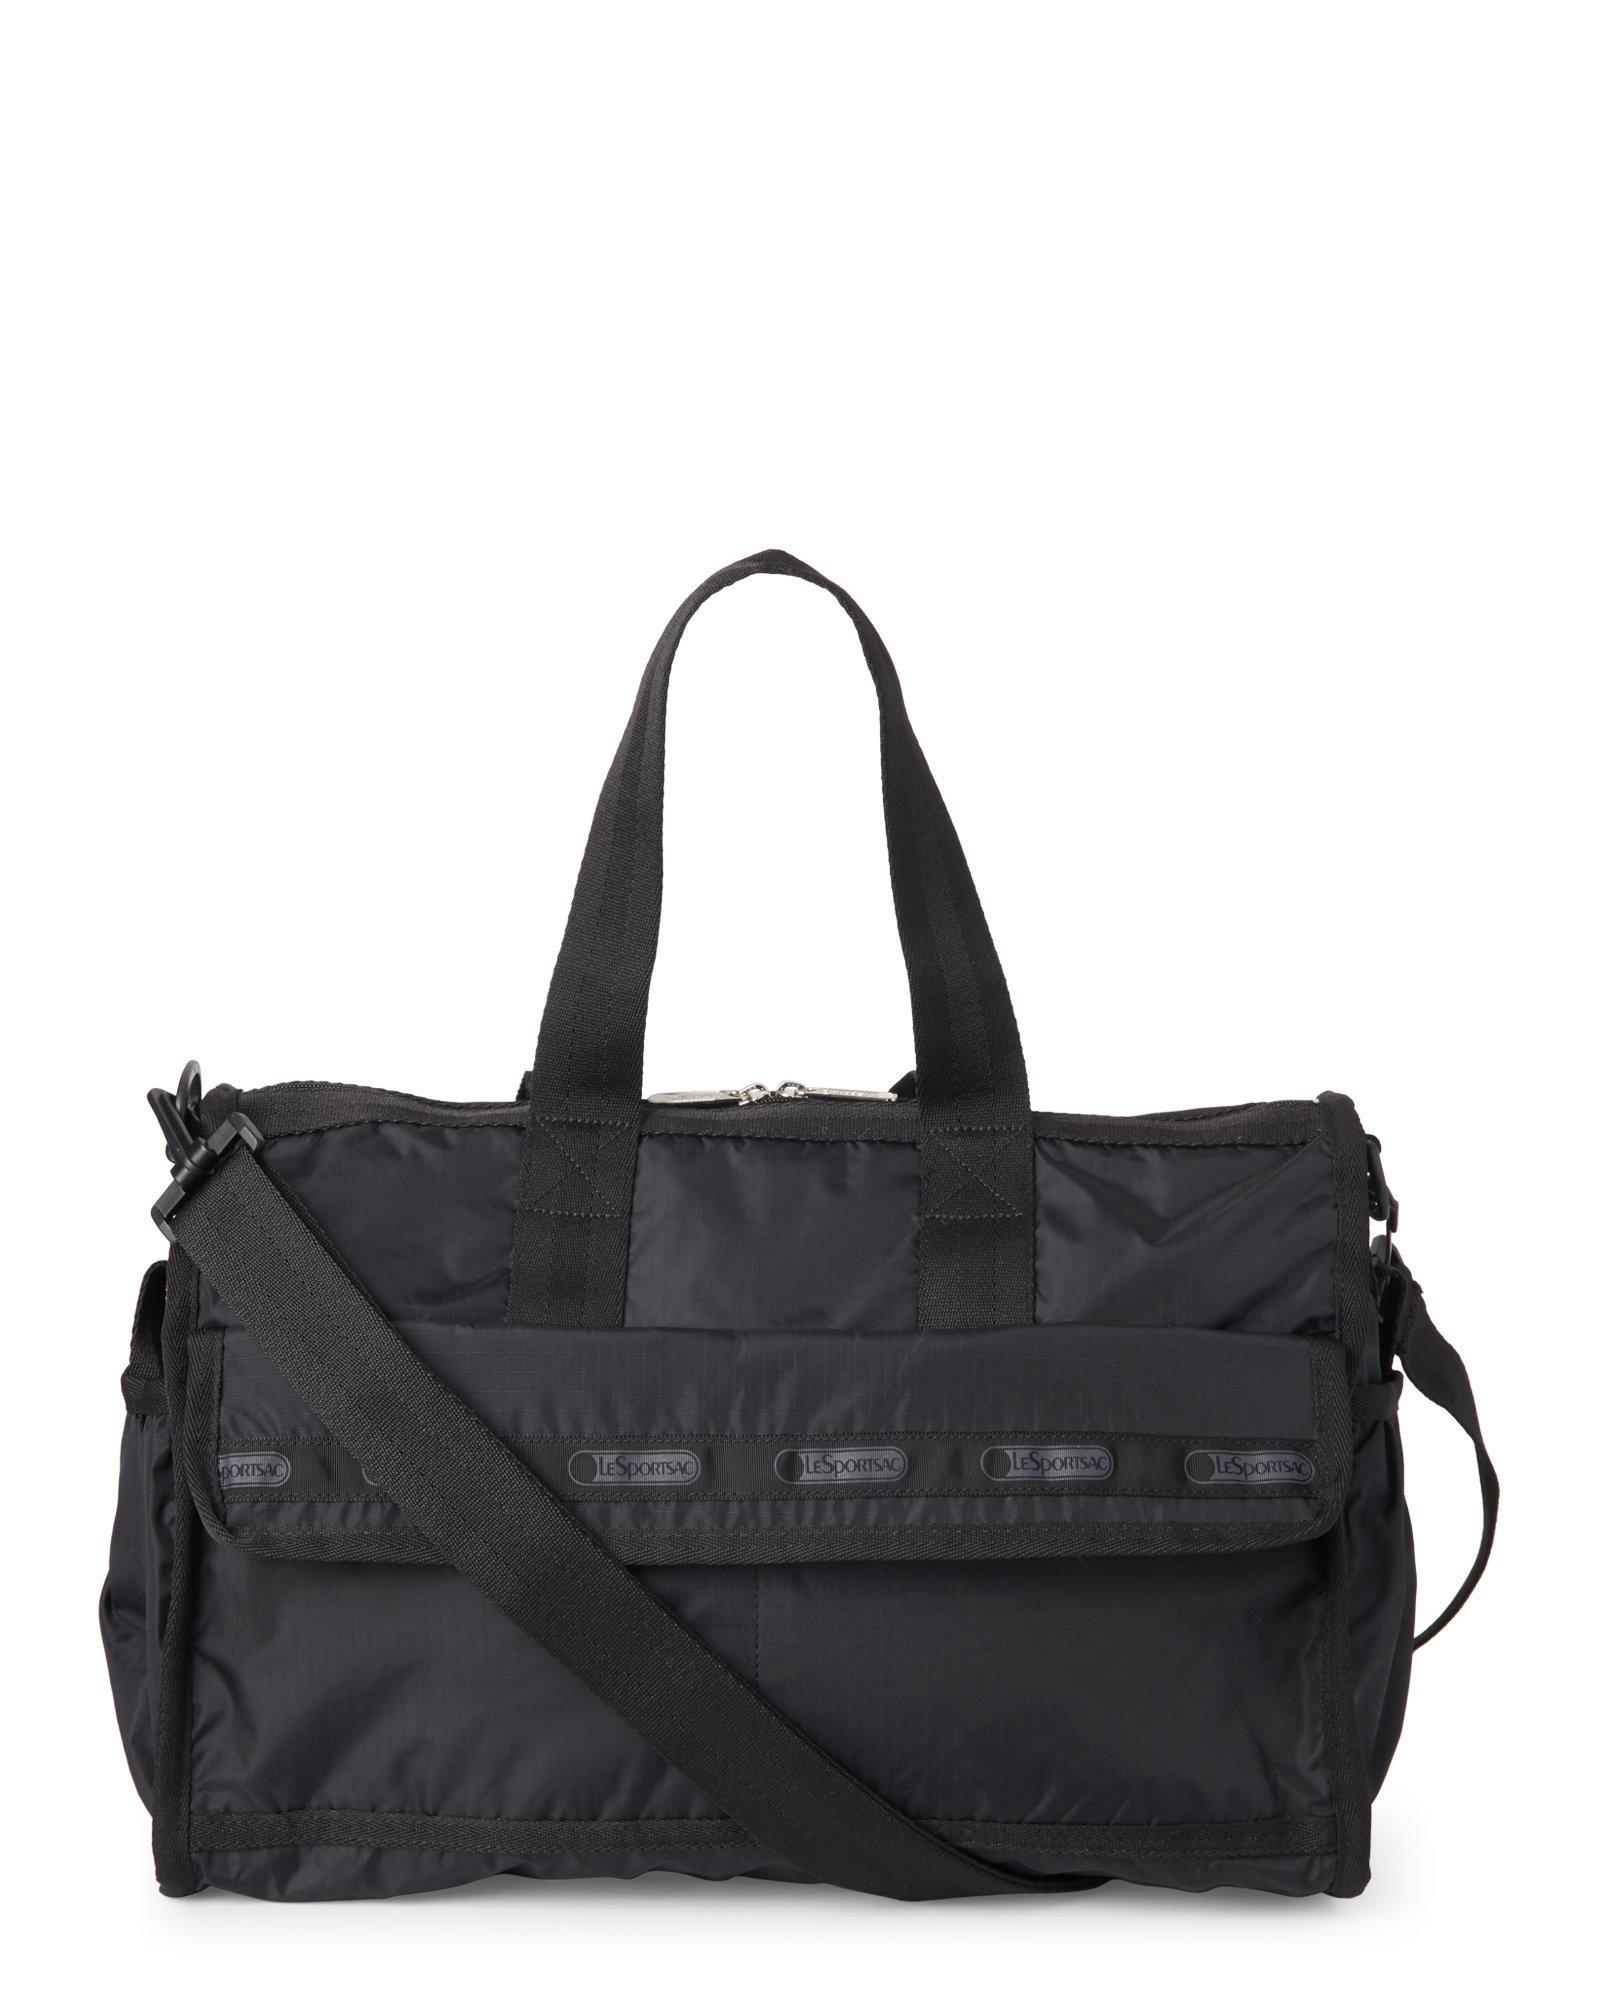 lesportsac black nylon travel baby bag in black lyst. Black Bedroom Furniture Sets. Home Design Ideas